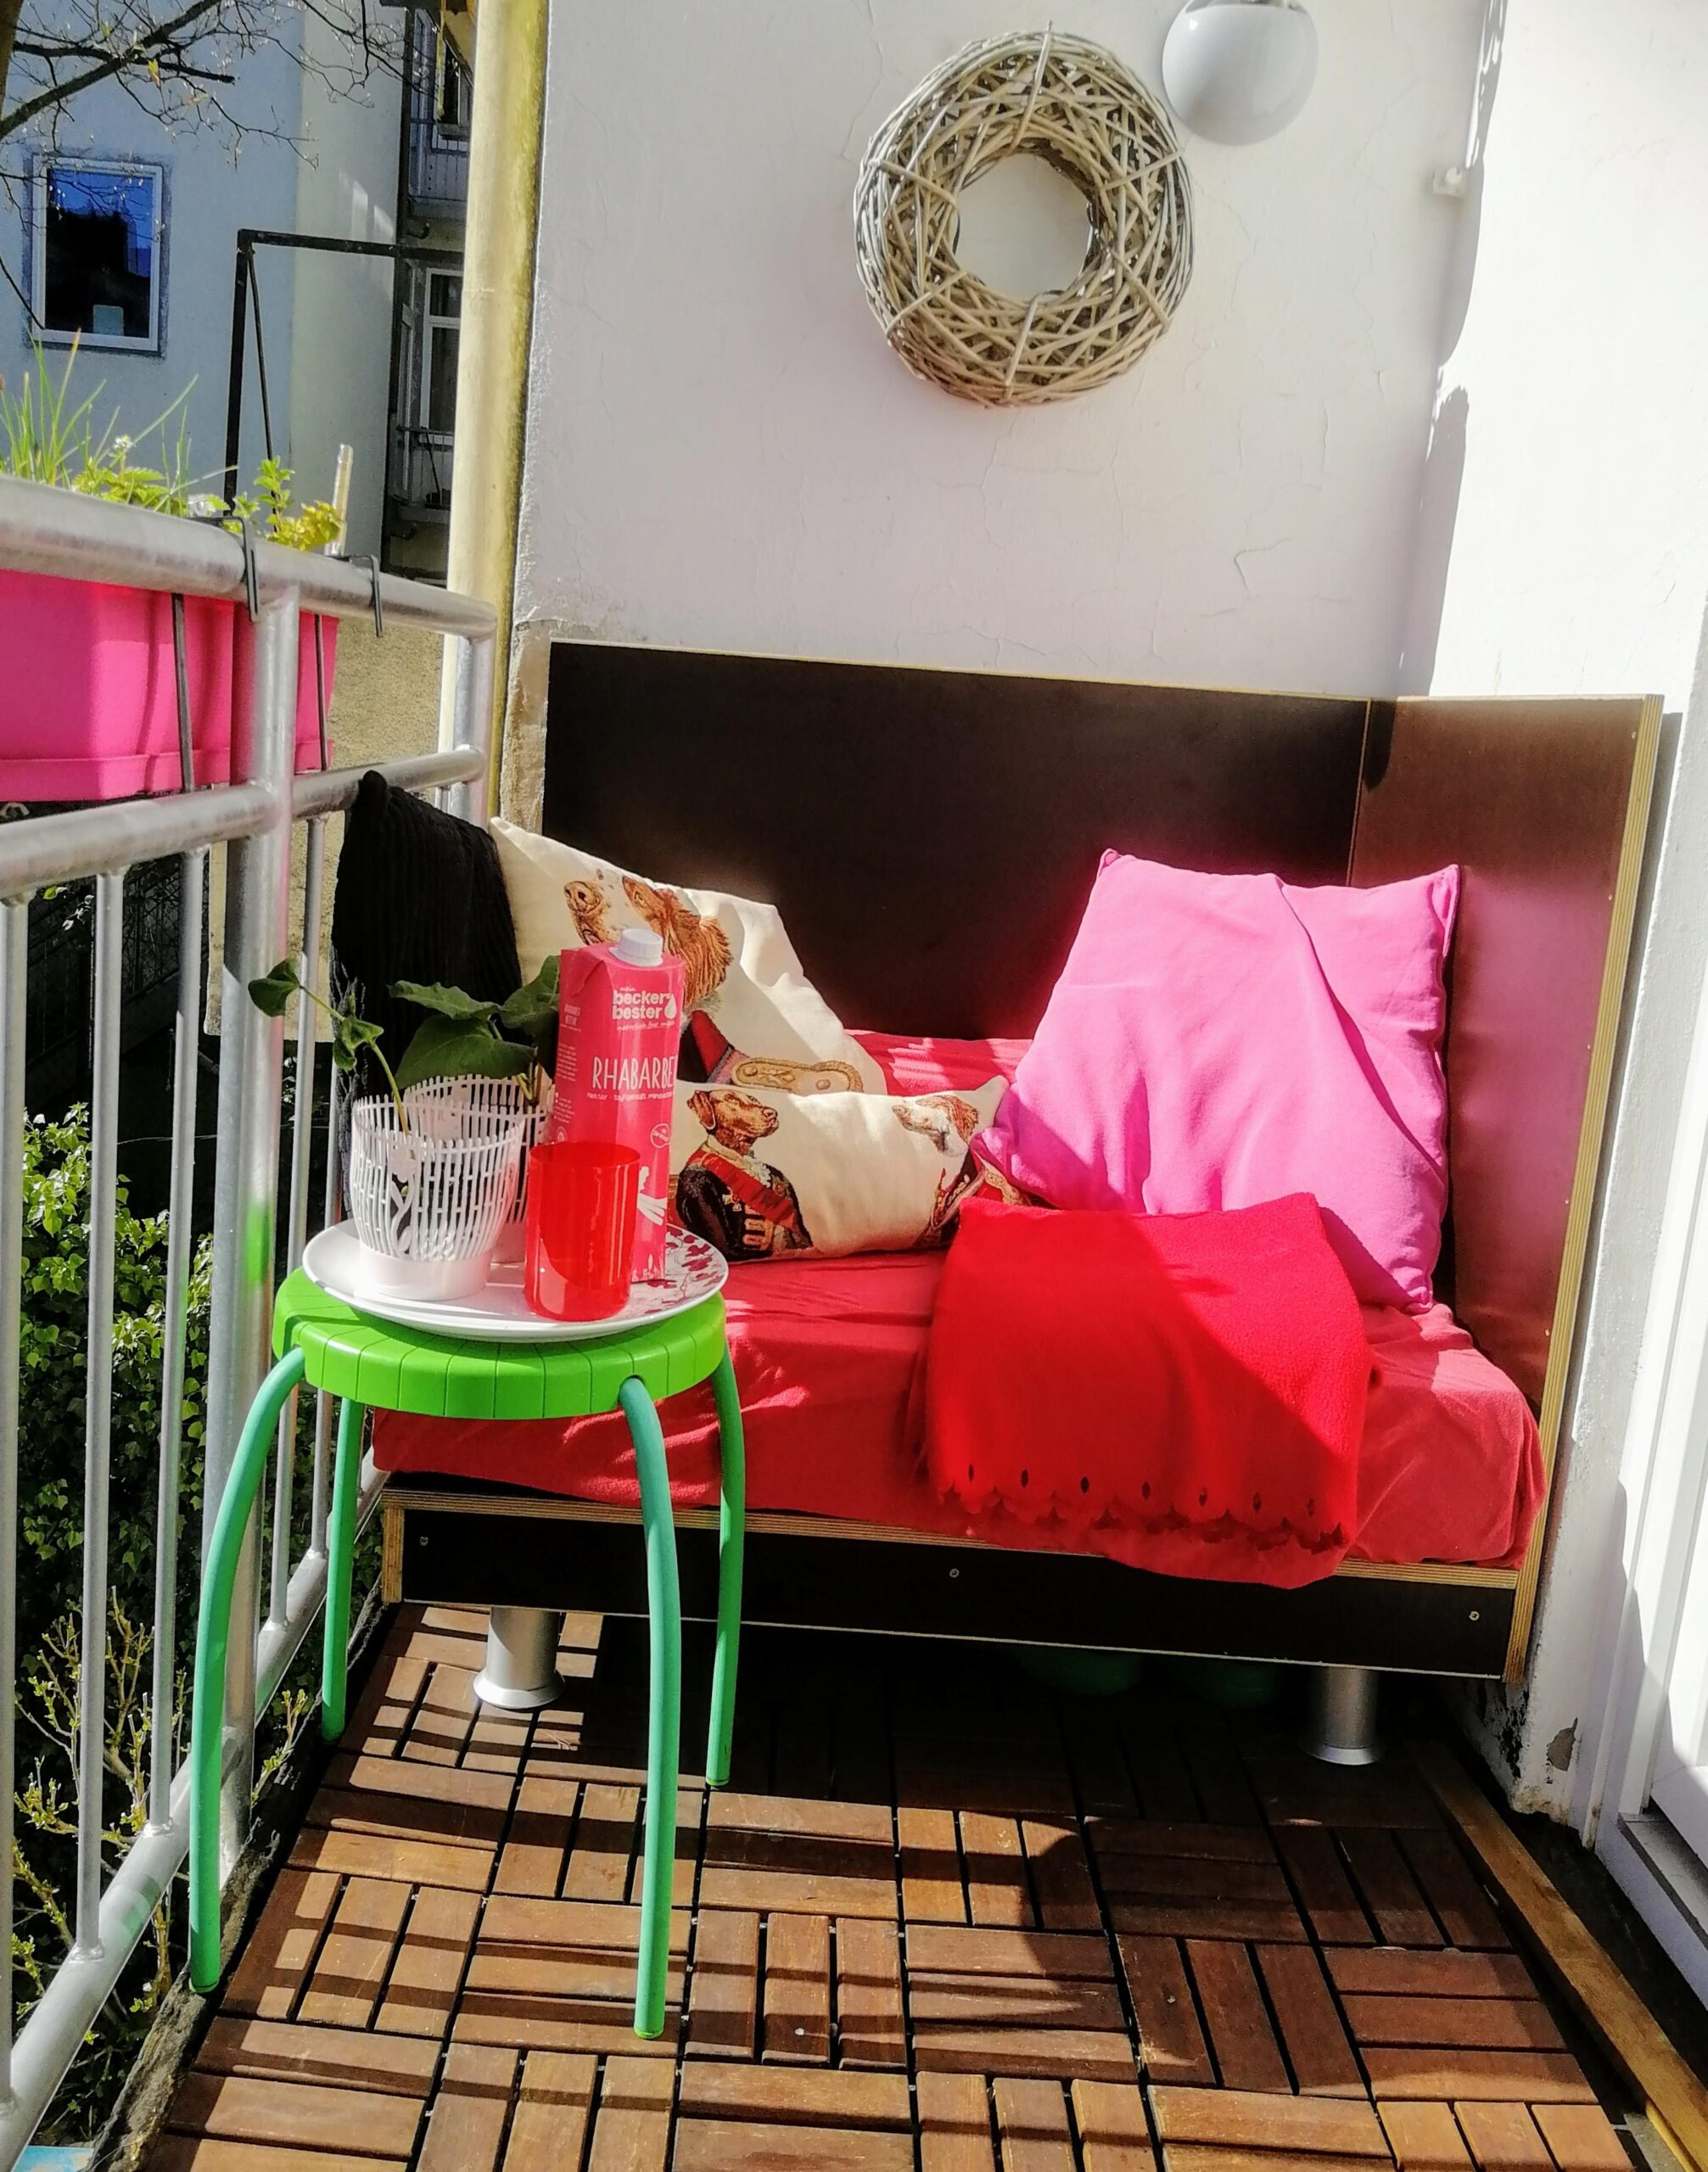 Full Size of Lounge Ecke Wohnzimmer Loungeecke Bilder Ideen Couch Komplett Lampe Loungemöbel Garten Holz Liege Deckenlampe Anbauwand Deckenlampen Deckenleuchten Wohnzimmer Lounge Ecke Wohnzimmer